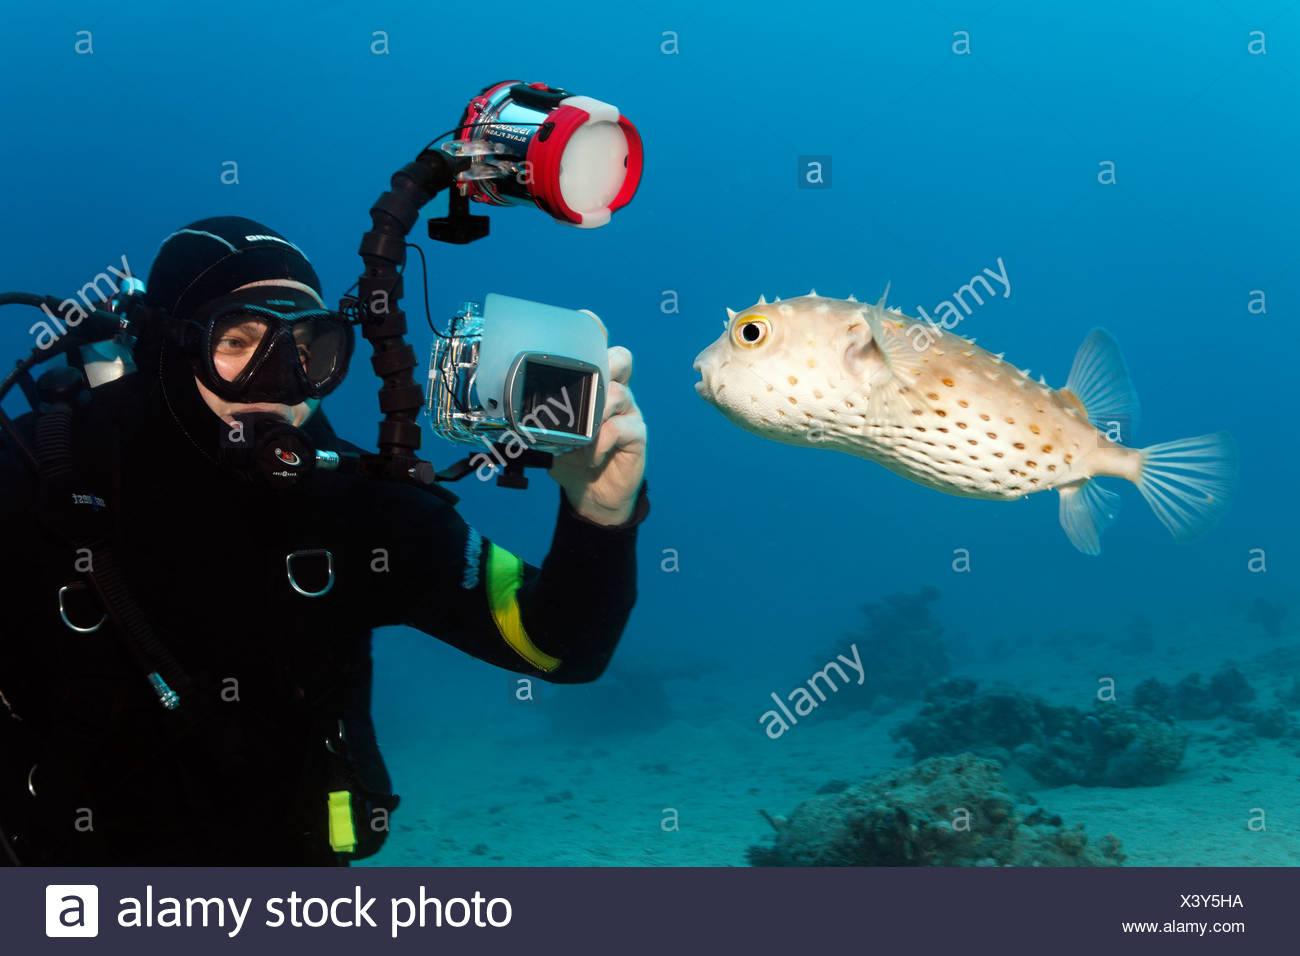 Taucher mit Unterwasser-Kamera nehmen Foto gelb gefleckten Burrfish (Chilomycterus Spilostylus), Makadi Bay, Hurghada, Ägypten Stockbild